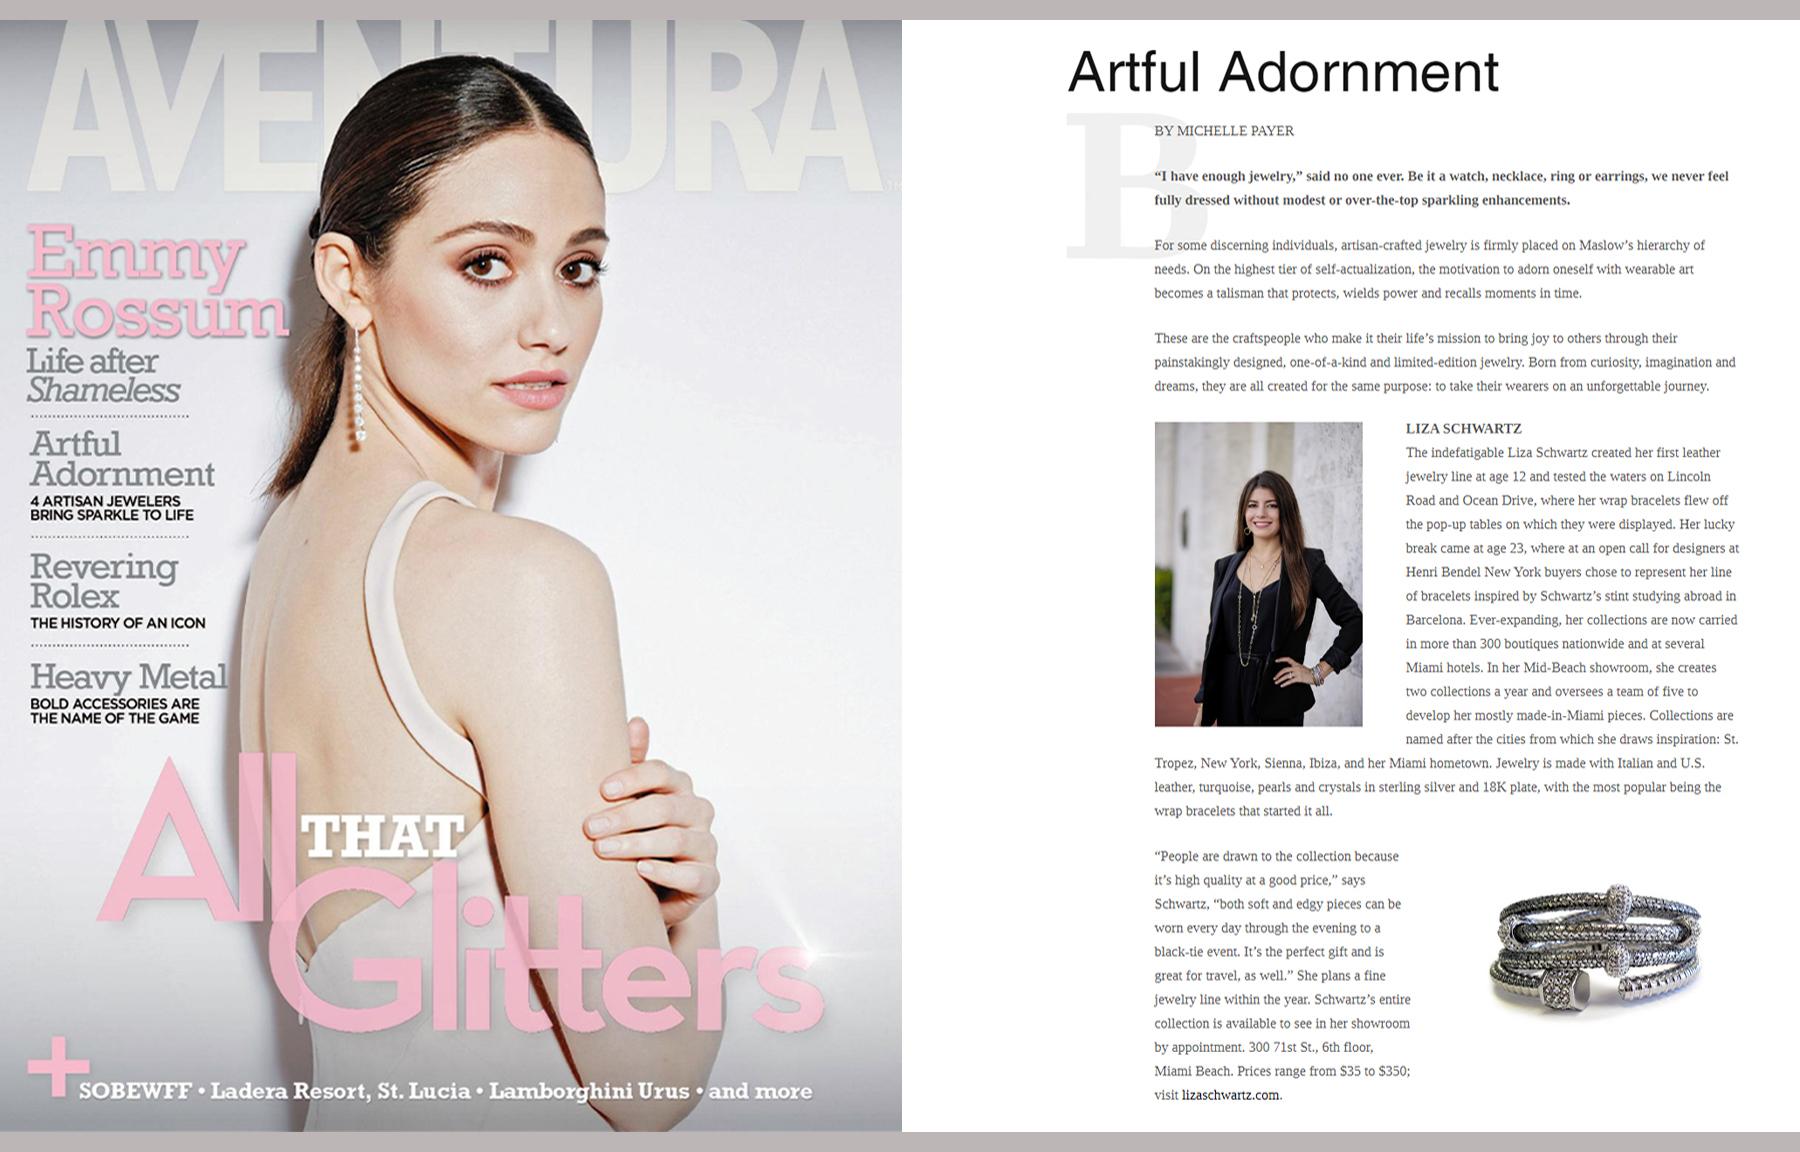 aventura1-feb2019-celebrity-page-mh.jpg